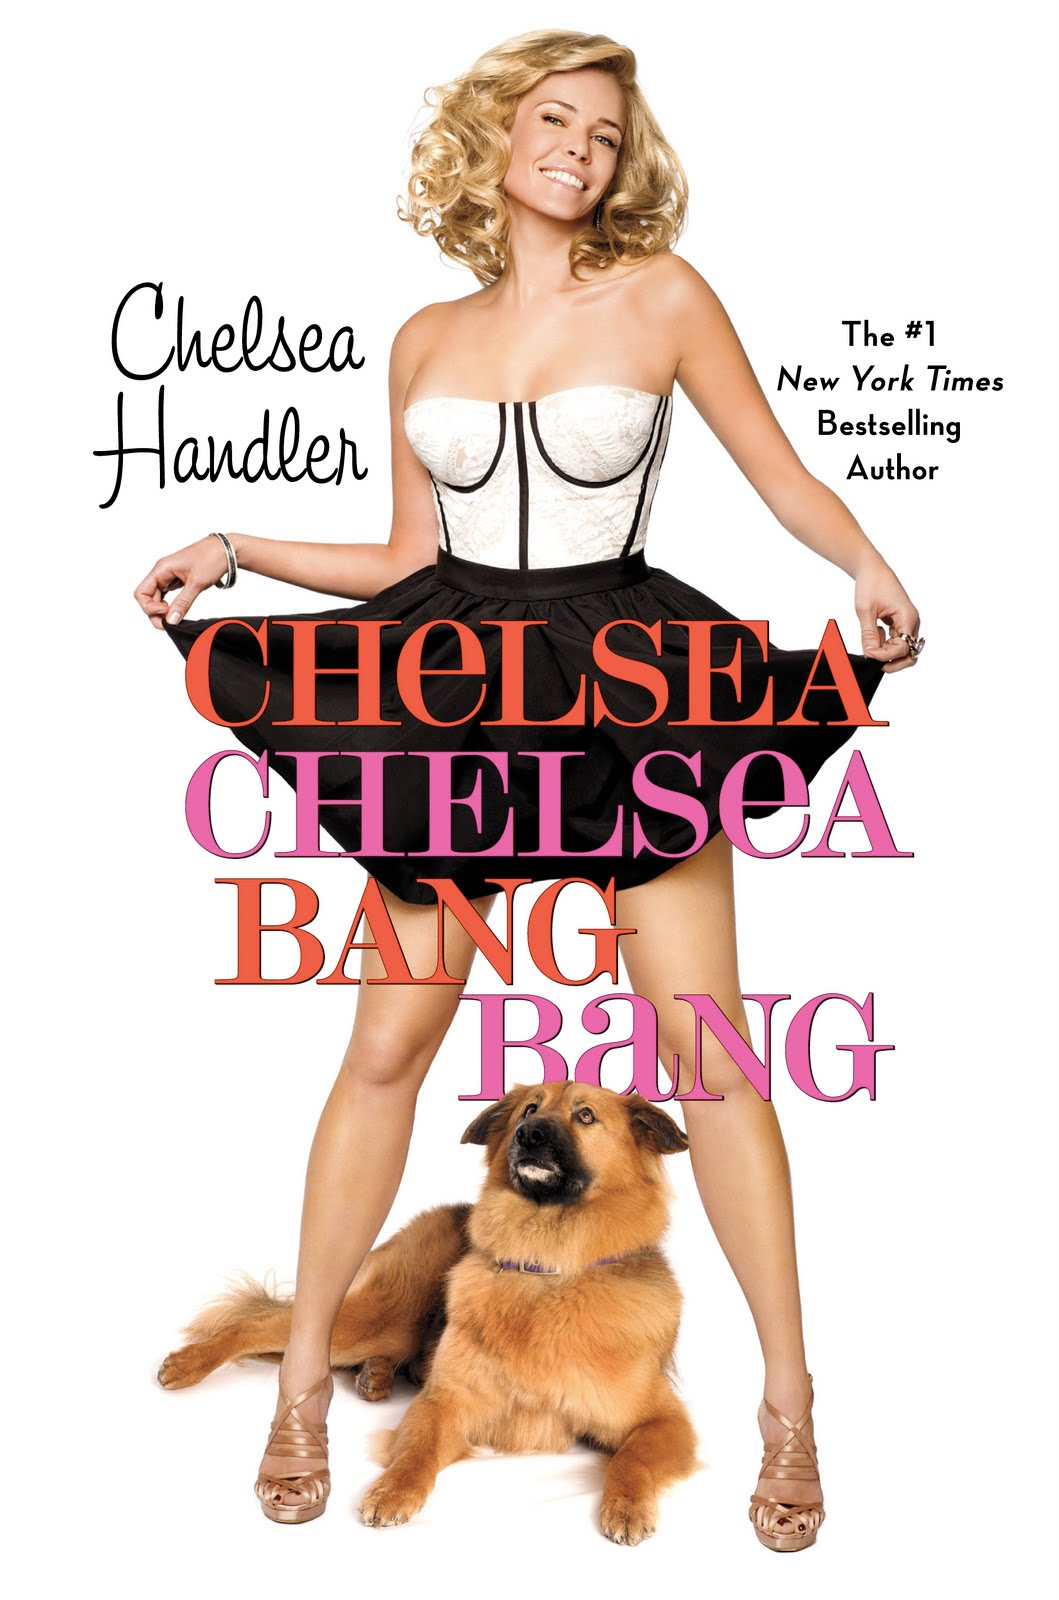 http://2.bp.blogspot.com/_5yzlVCe28mI/S8kBoP_a7zI/AAAAAAAAACI/-kRNljGbDaY/s1600/ChelseaChelseaBangBang_hires.jpg